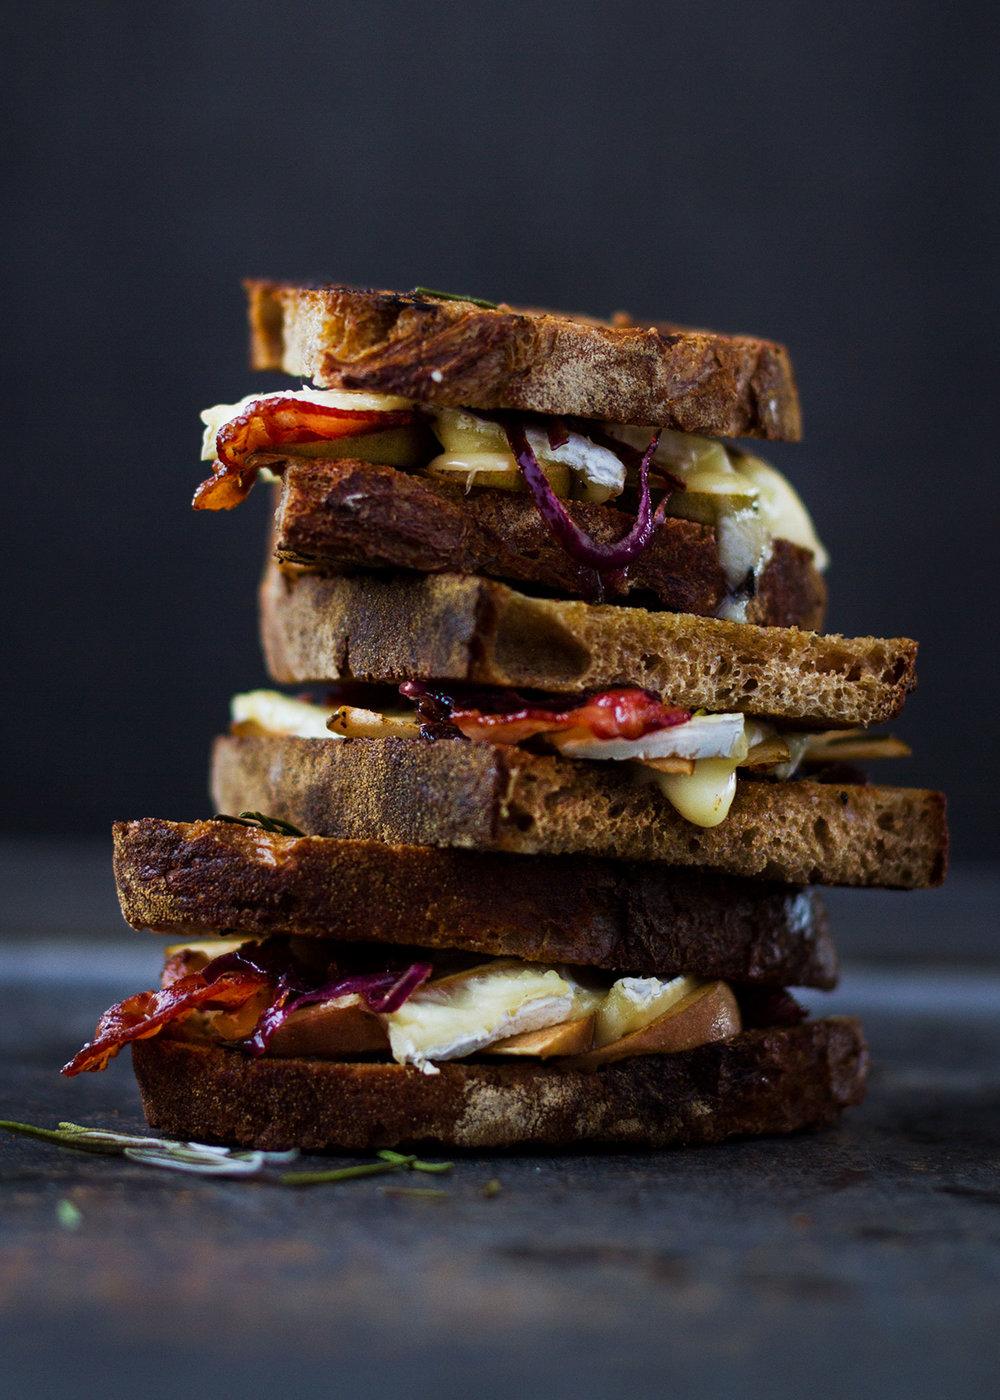 02_NOMNOM_Sandwich_Apfel_Brie_Speck.jpg